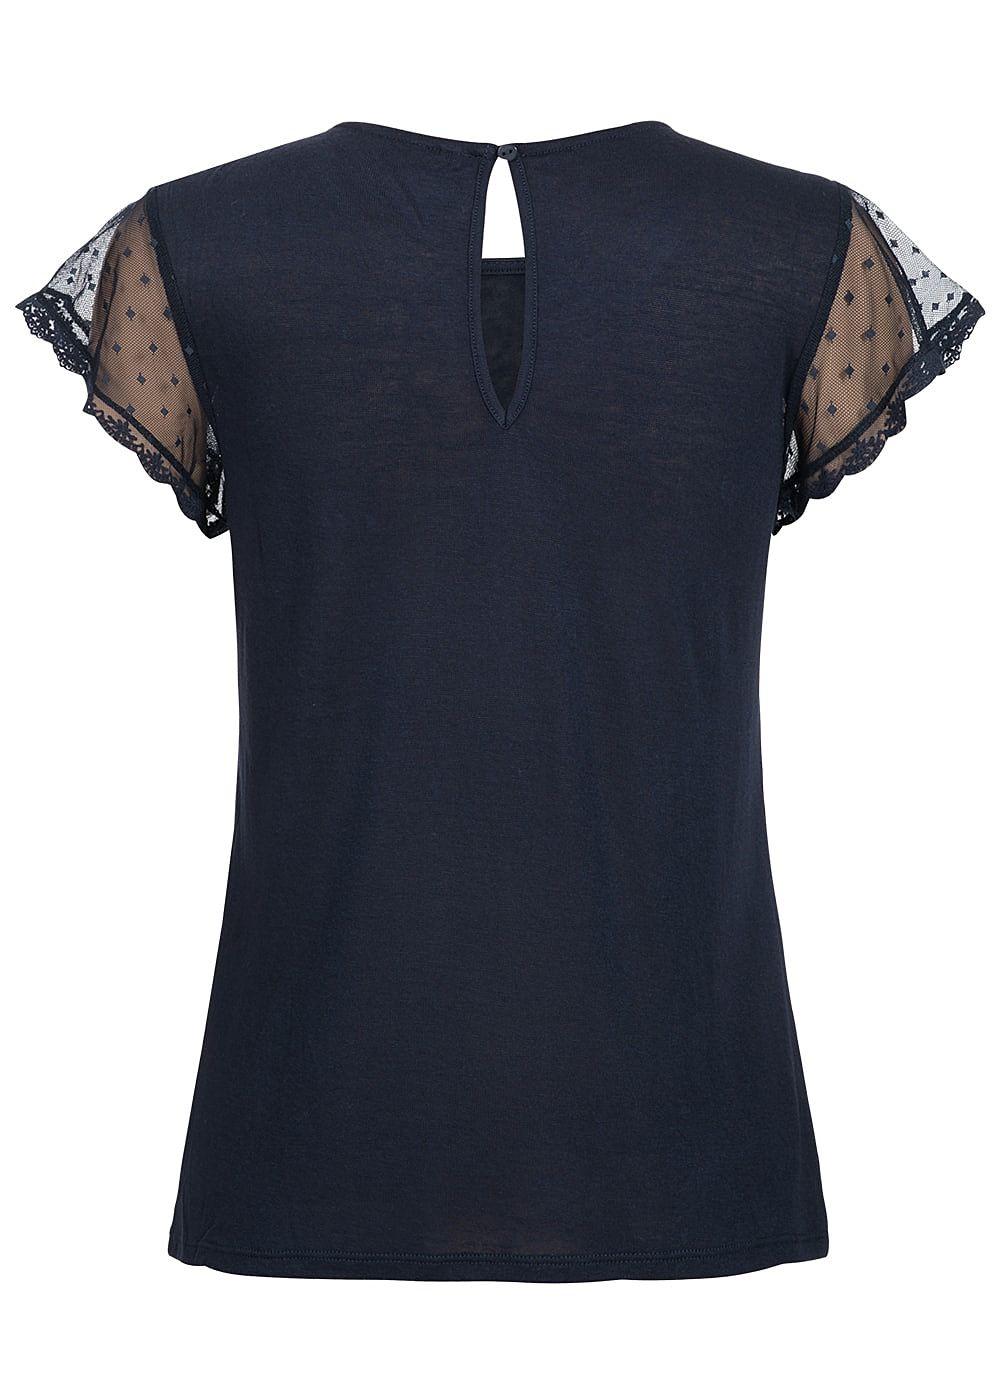 only damen t shirt mit spitzen rmel night sky blau 77onlineshop. Black Bedroom Furniture Sets. Home Design Ideas